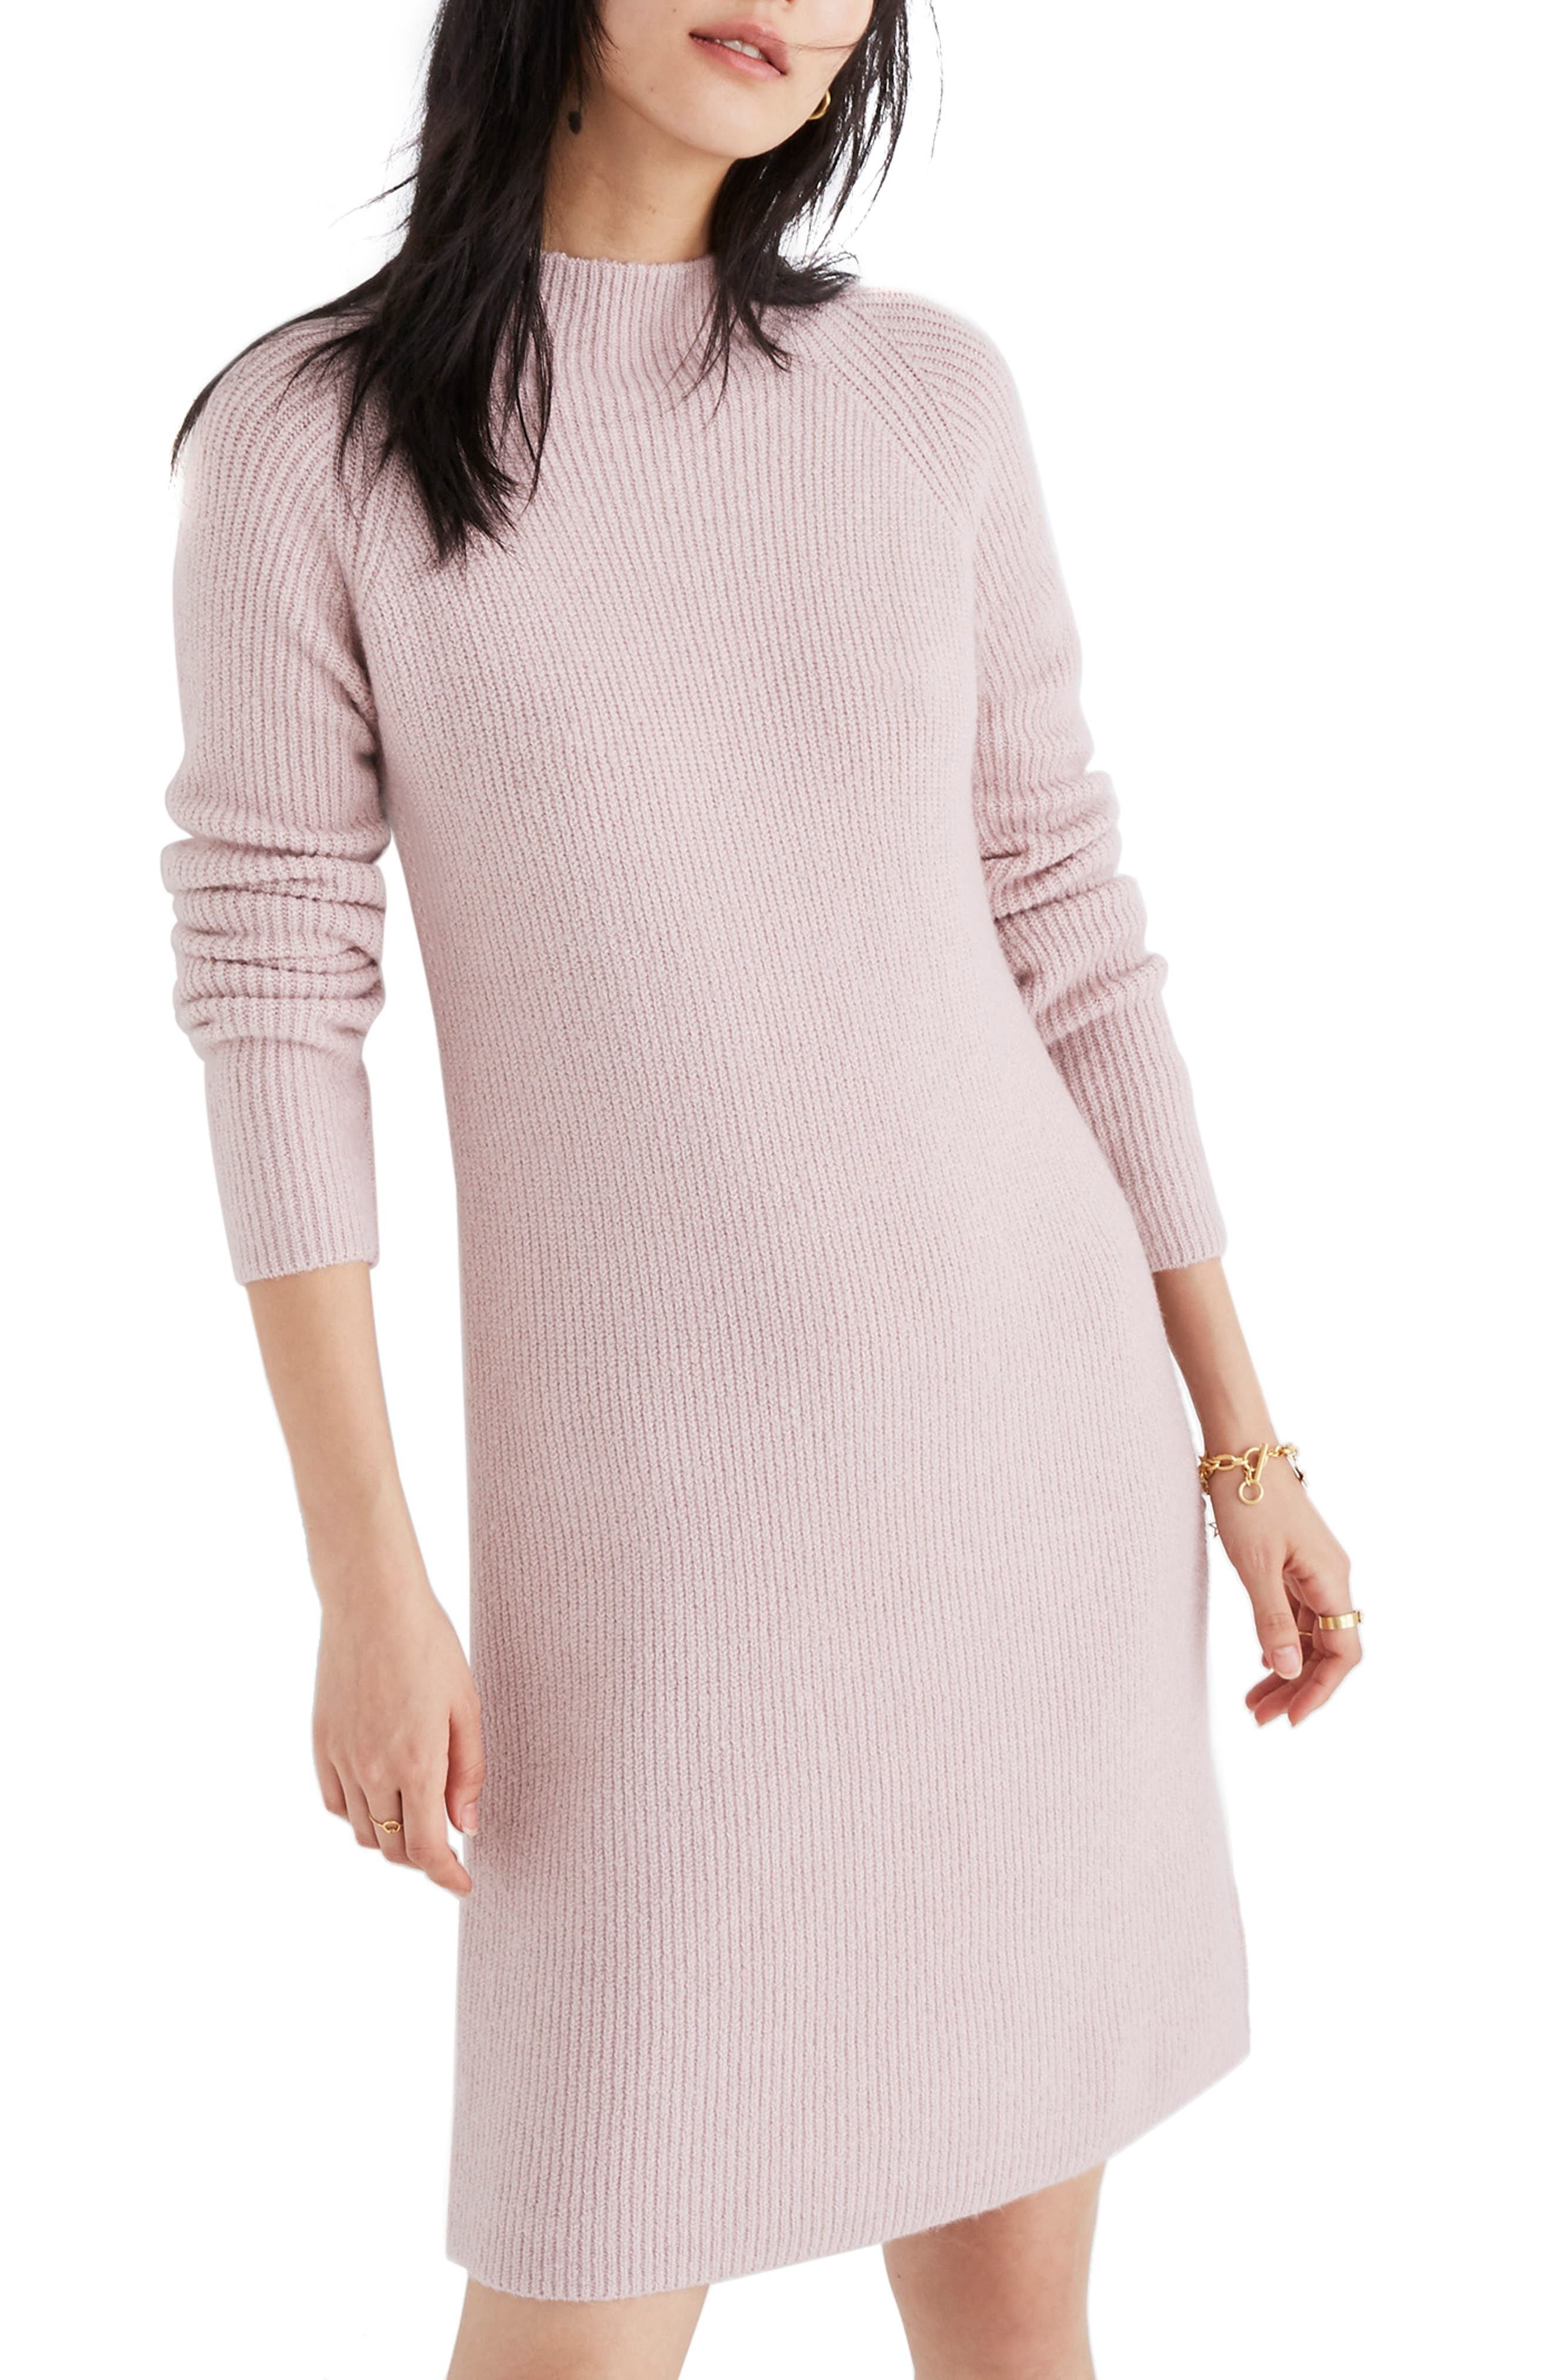 Madewell Northfield Mock Neck Sweater Dress